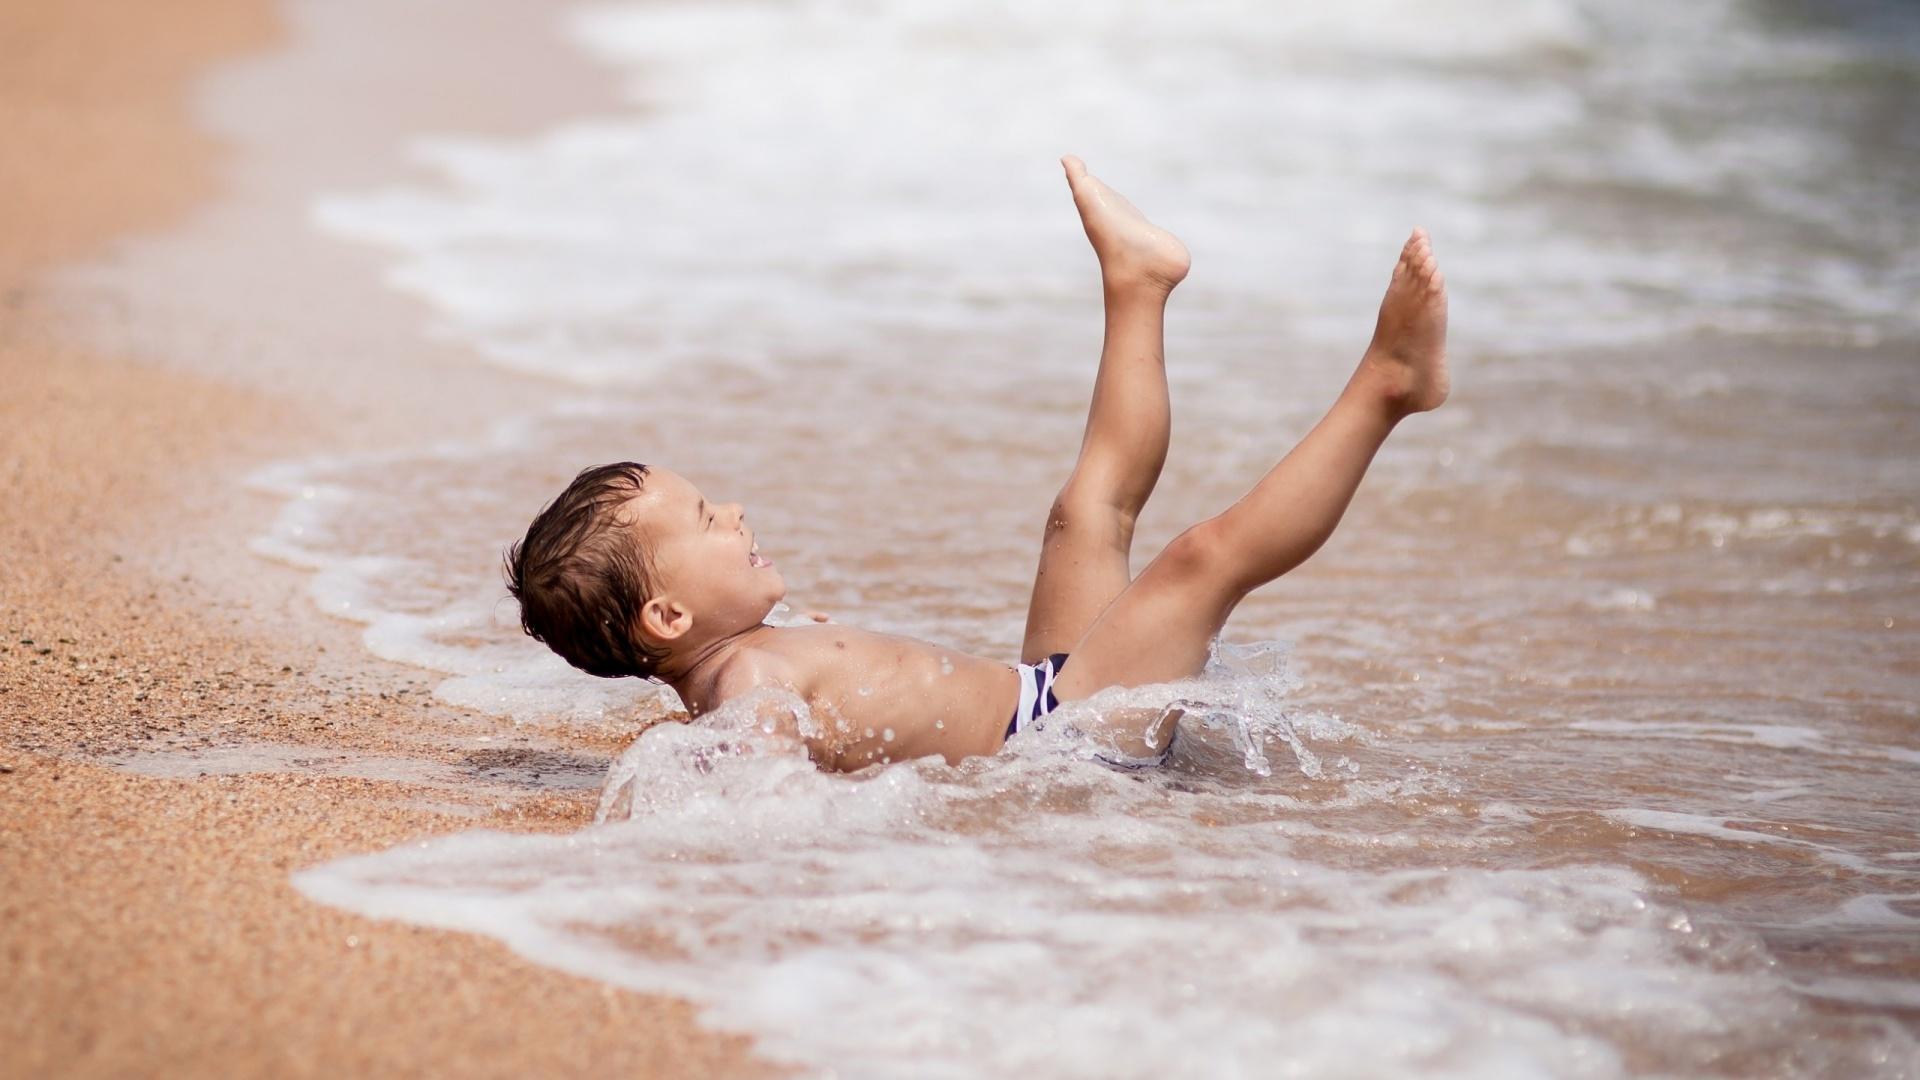 Baby-Boy-Enjoying-Beach-Bathing-wallpaper-wp4603978-1